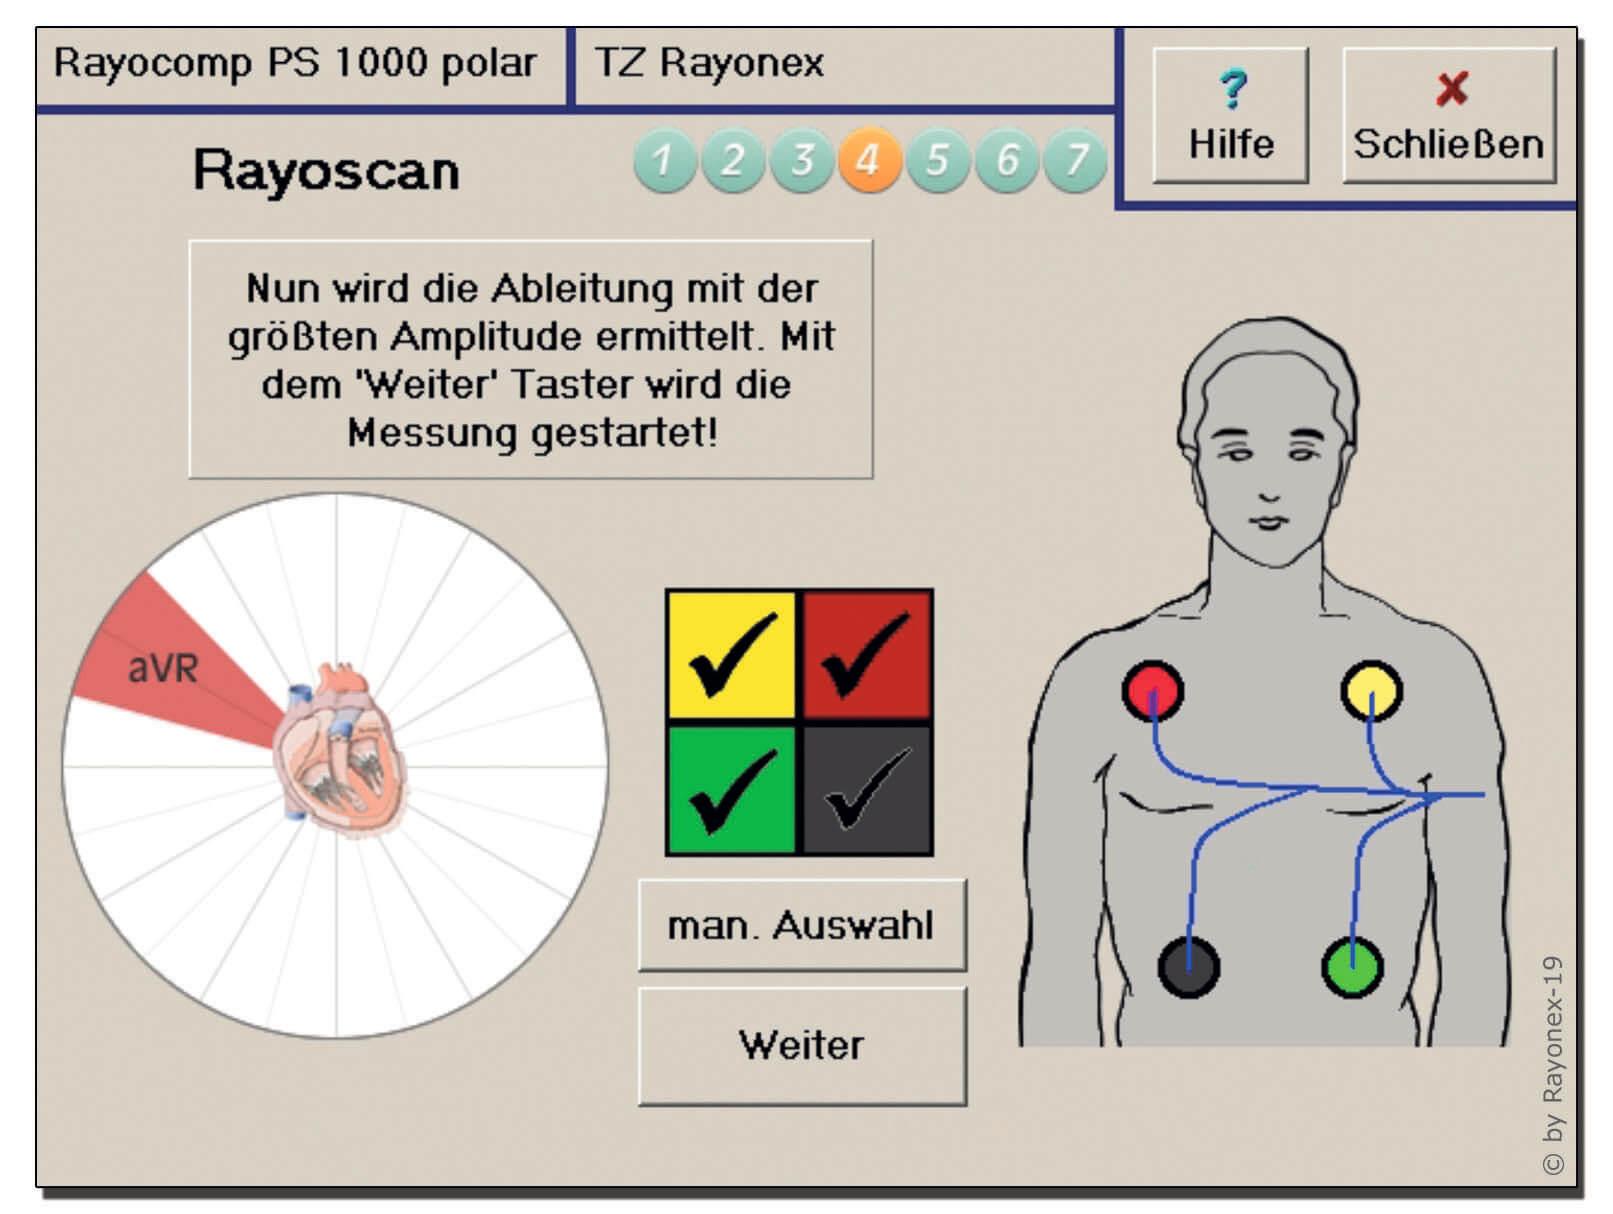 Bioresonanzbehandlung nach Paul Schmidt Rayonex 4